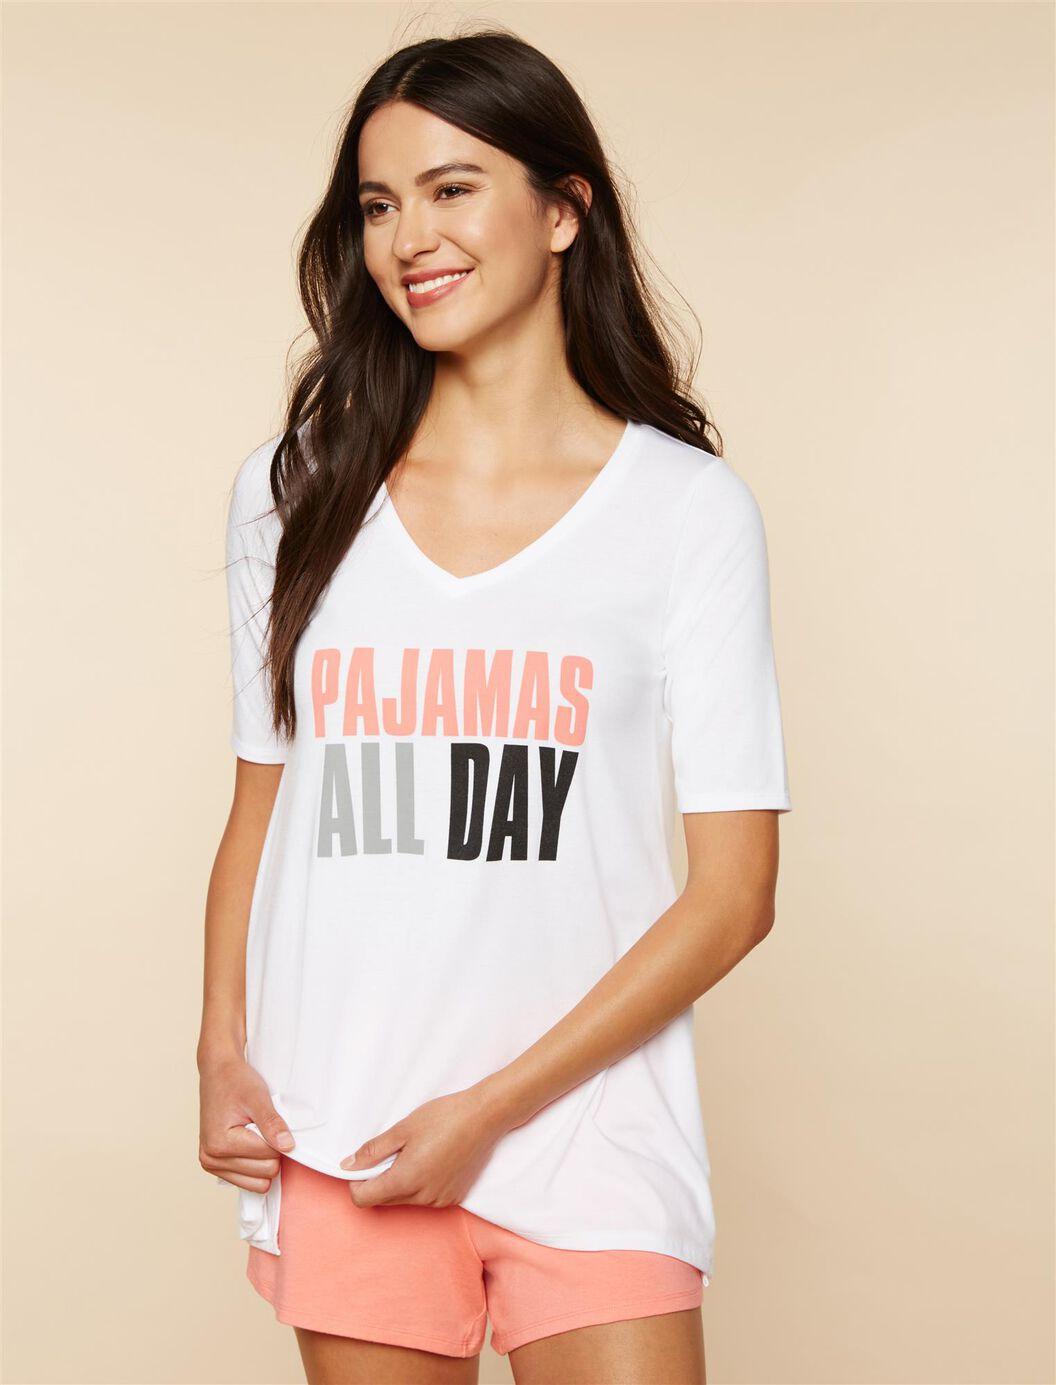 Pajamas All Day Nursing Sleep Top at Motherhood Maternity in Victor, NY | Tuggl